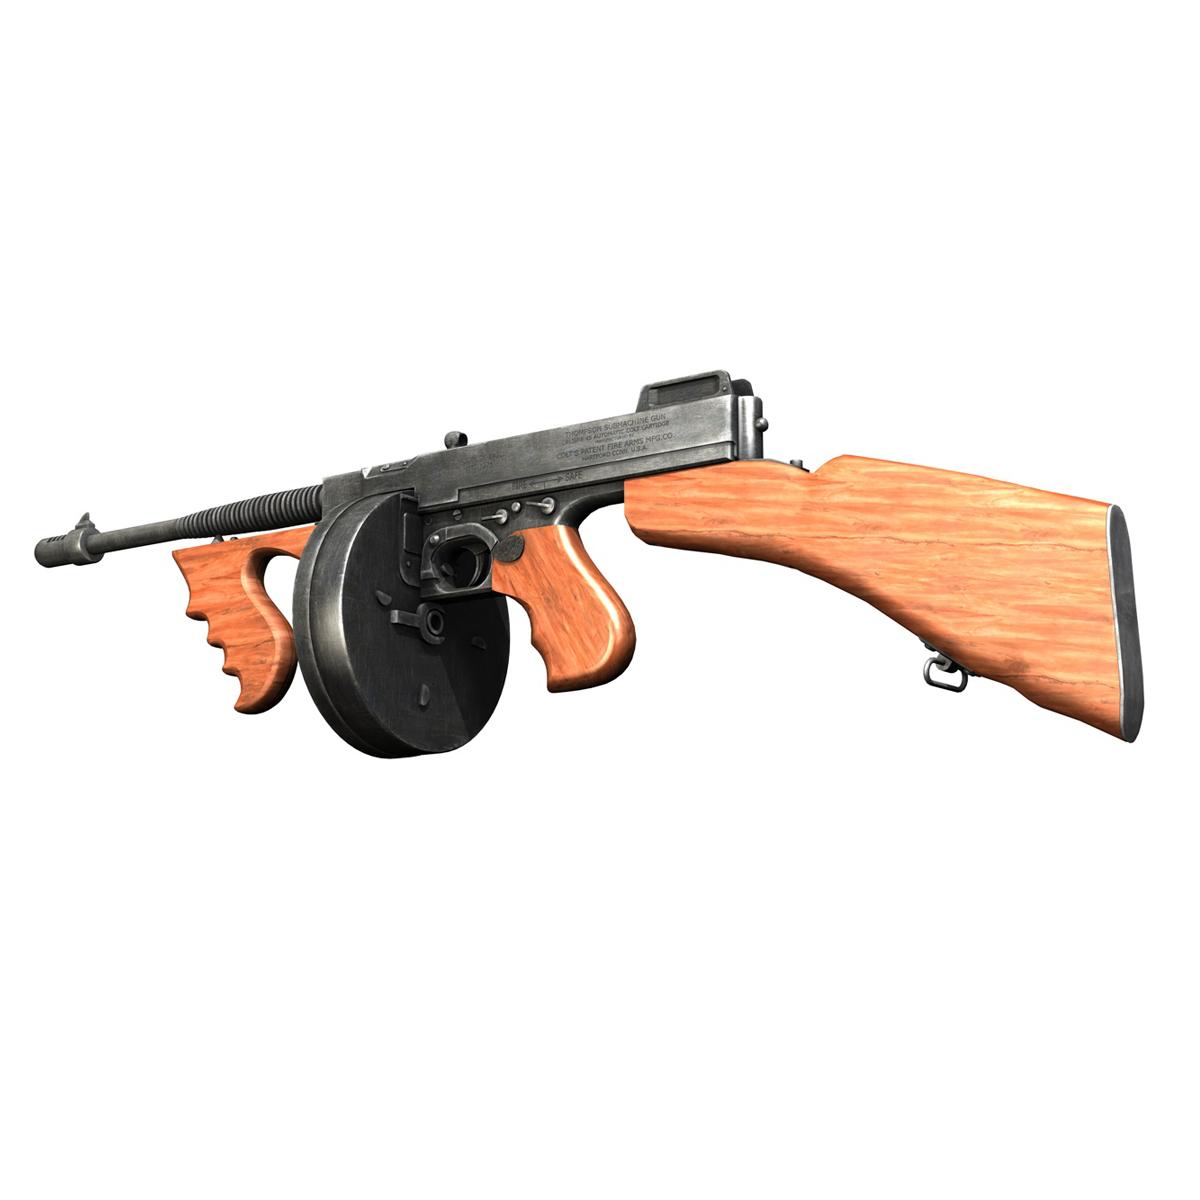 colt model1921 thompson submachine gun 3d model 3ds c4d lwo obj 264707